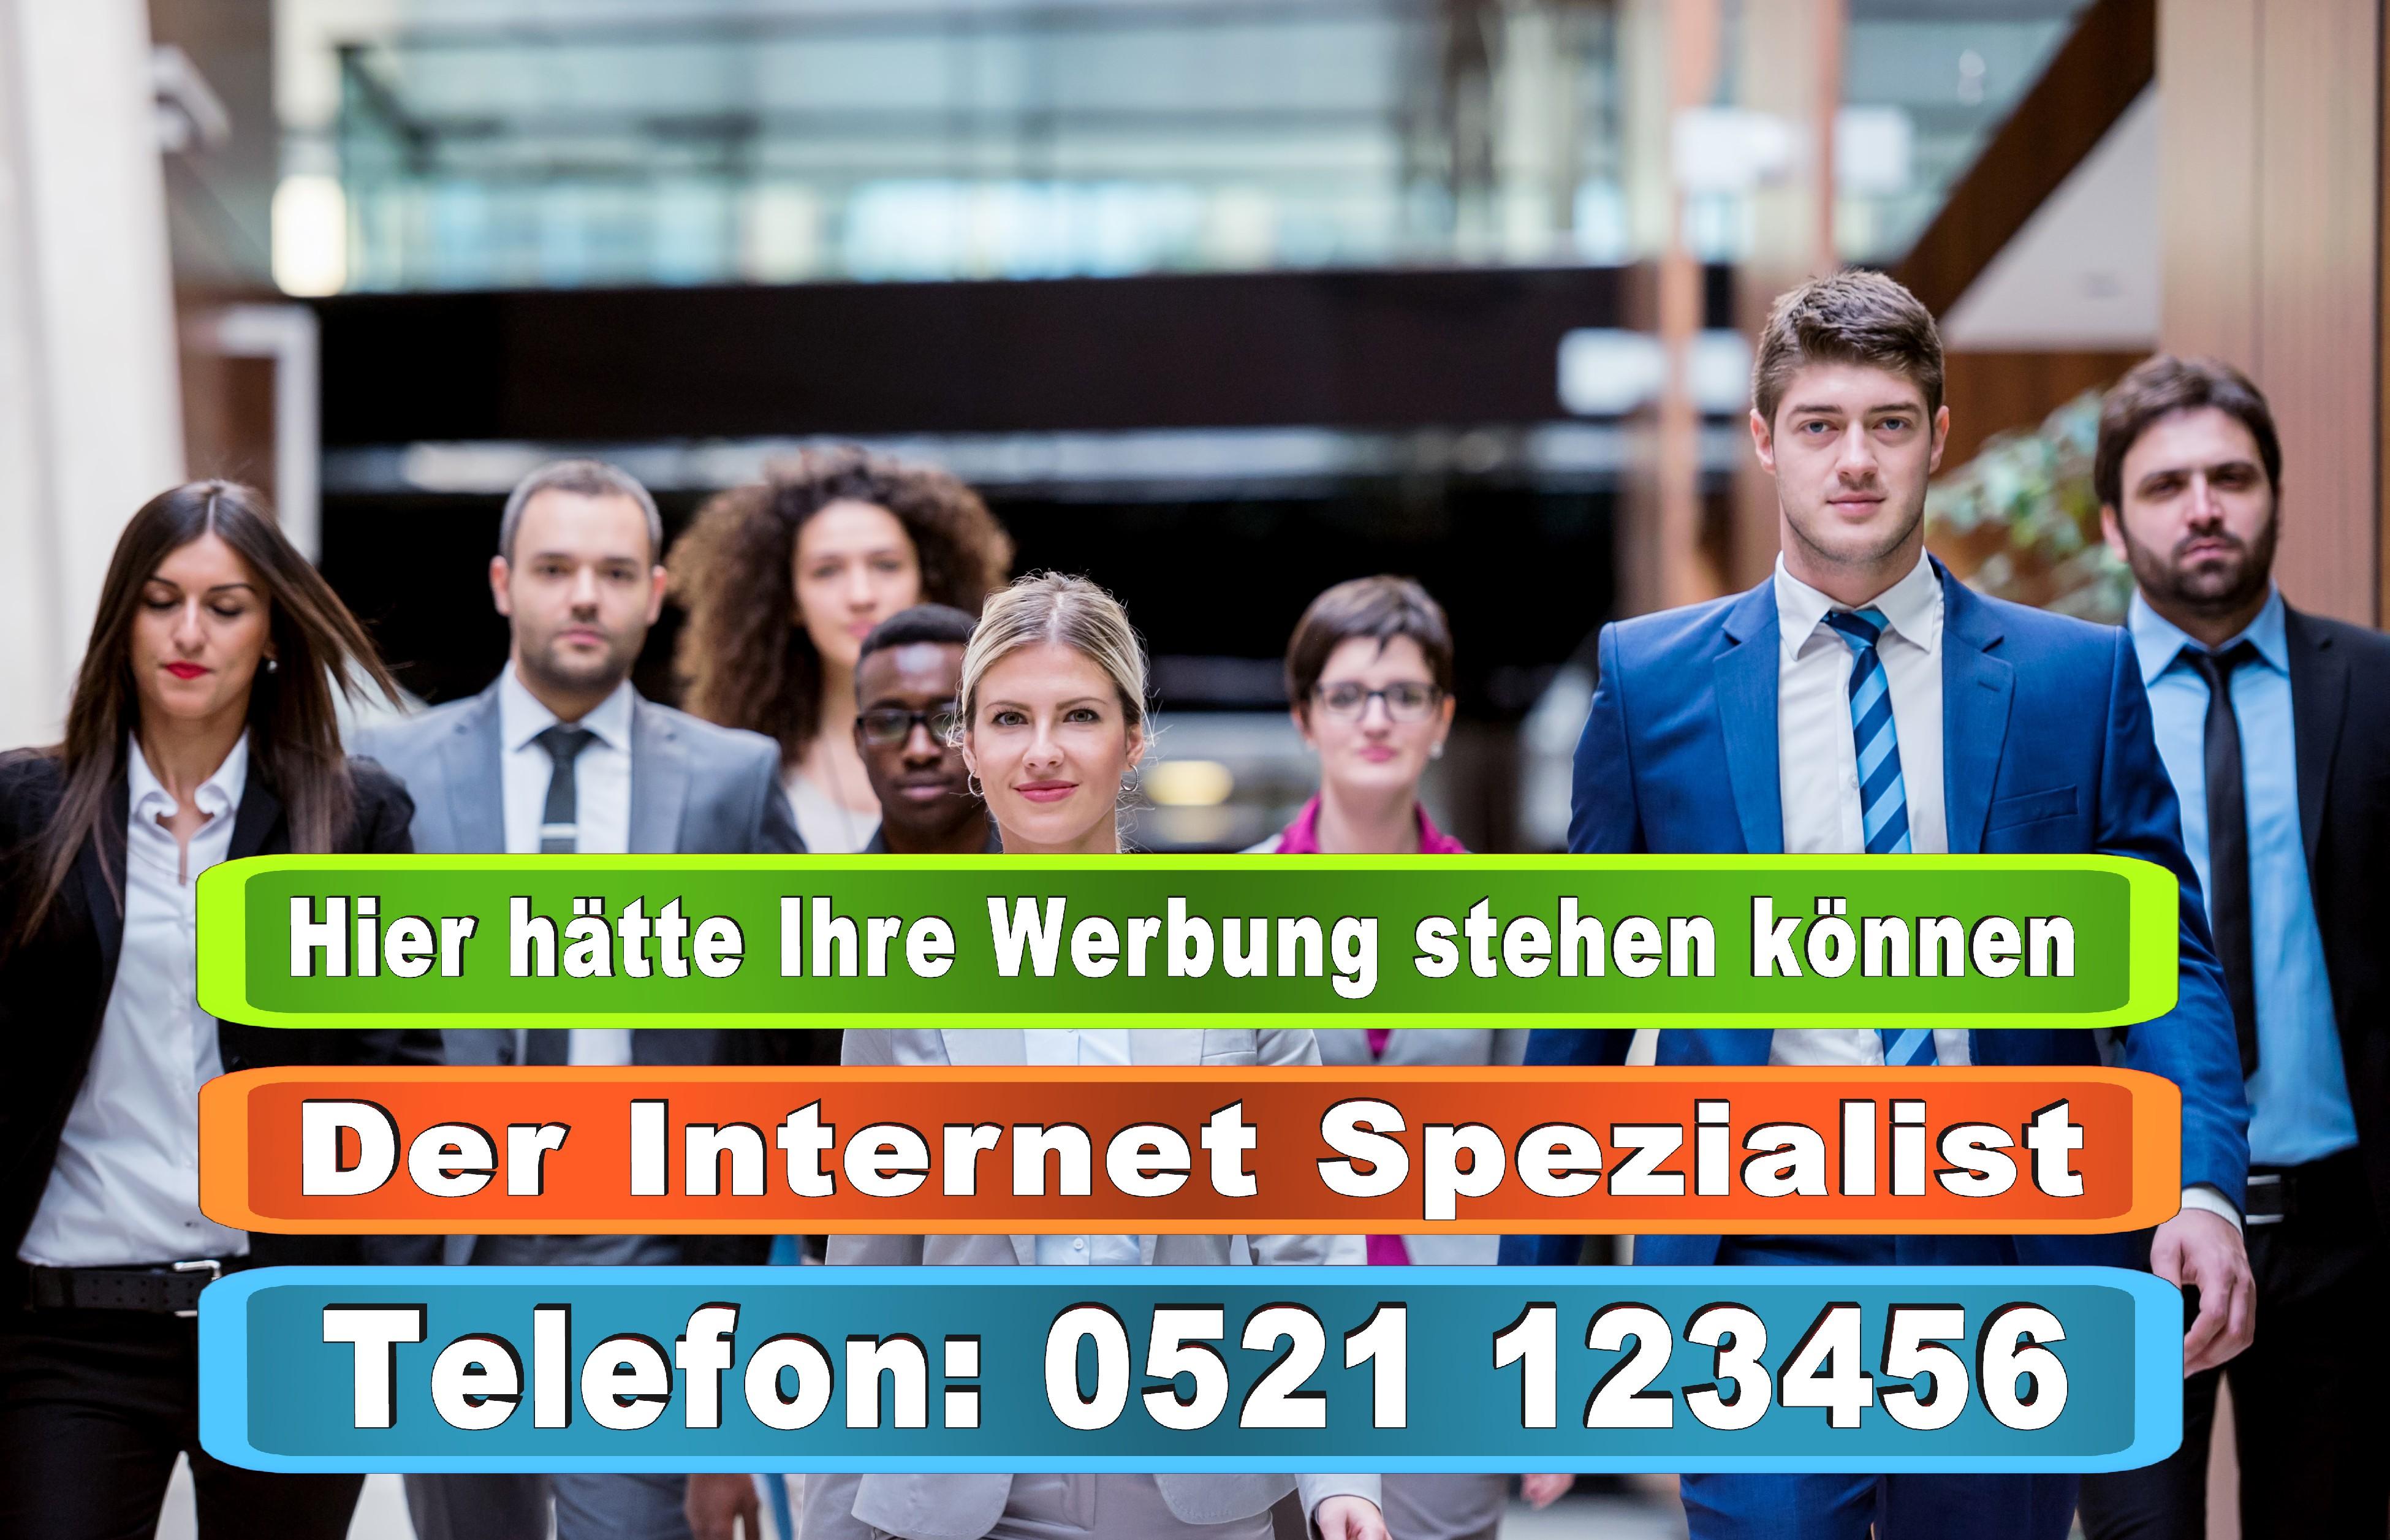 Rechtsanwaltskanzlei Bielefeld NRW OWL Rechtsanwalt Kanzlei Büro Steuerberater Bielefeld Architekt Bielefeld (26)